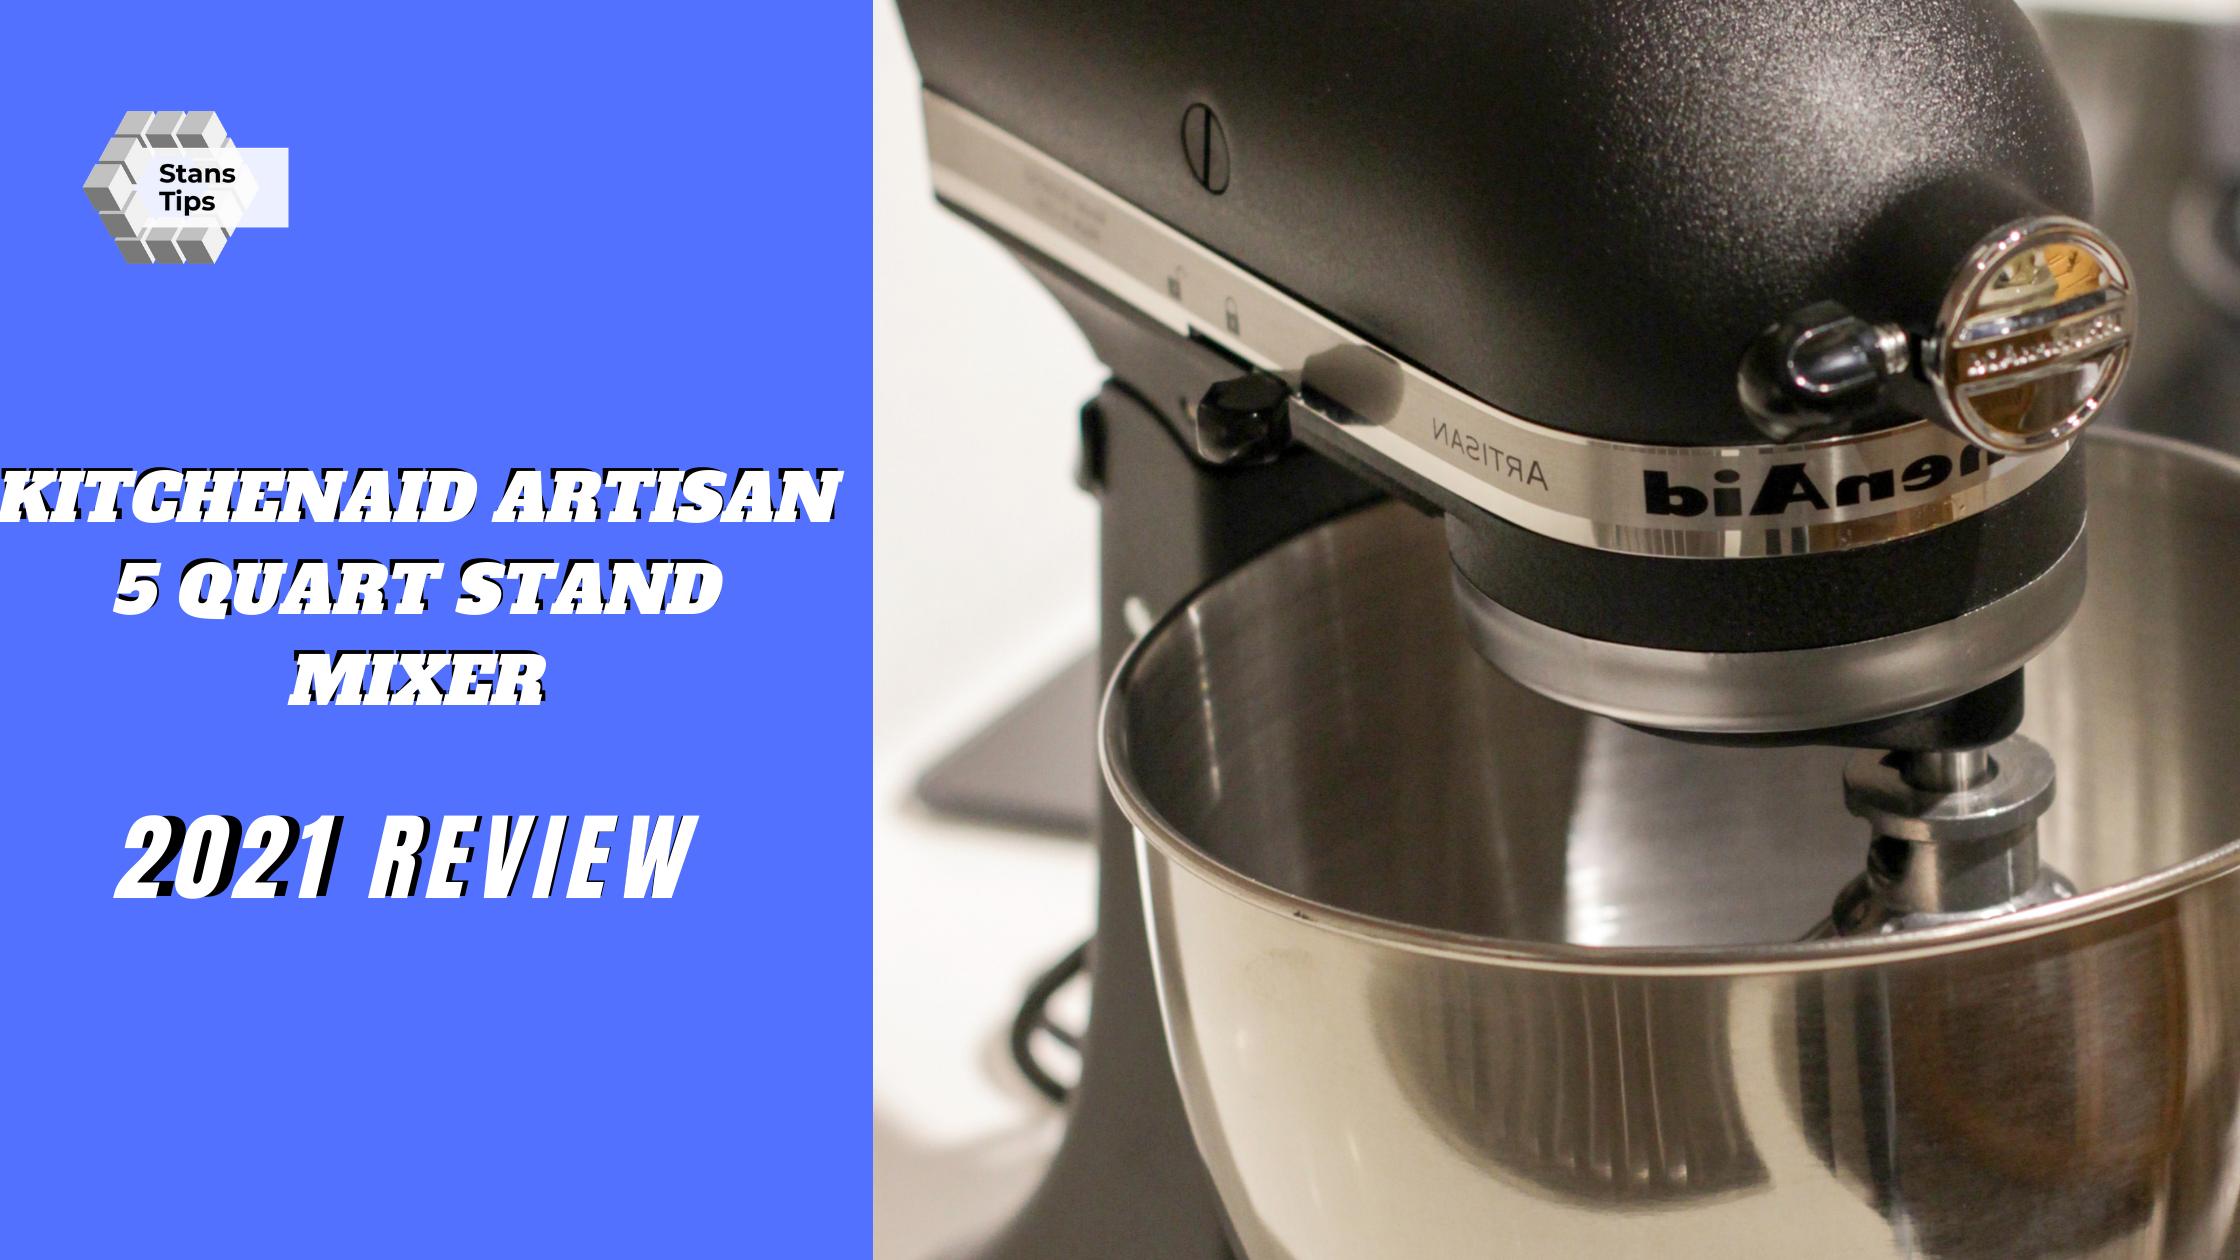 Kitchenaid artisan 5 quart stand mixer review in 2021